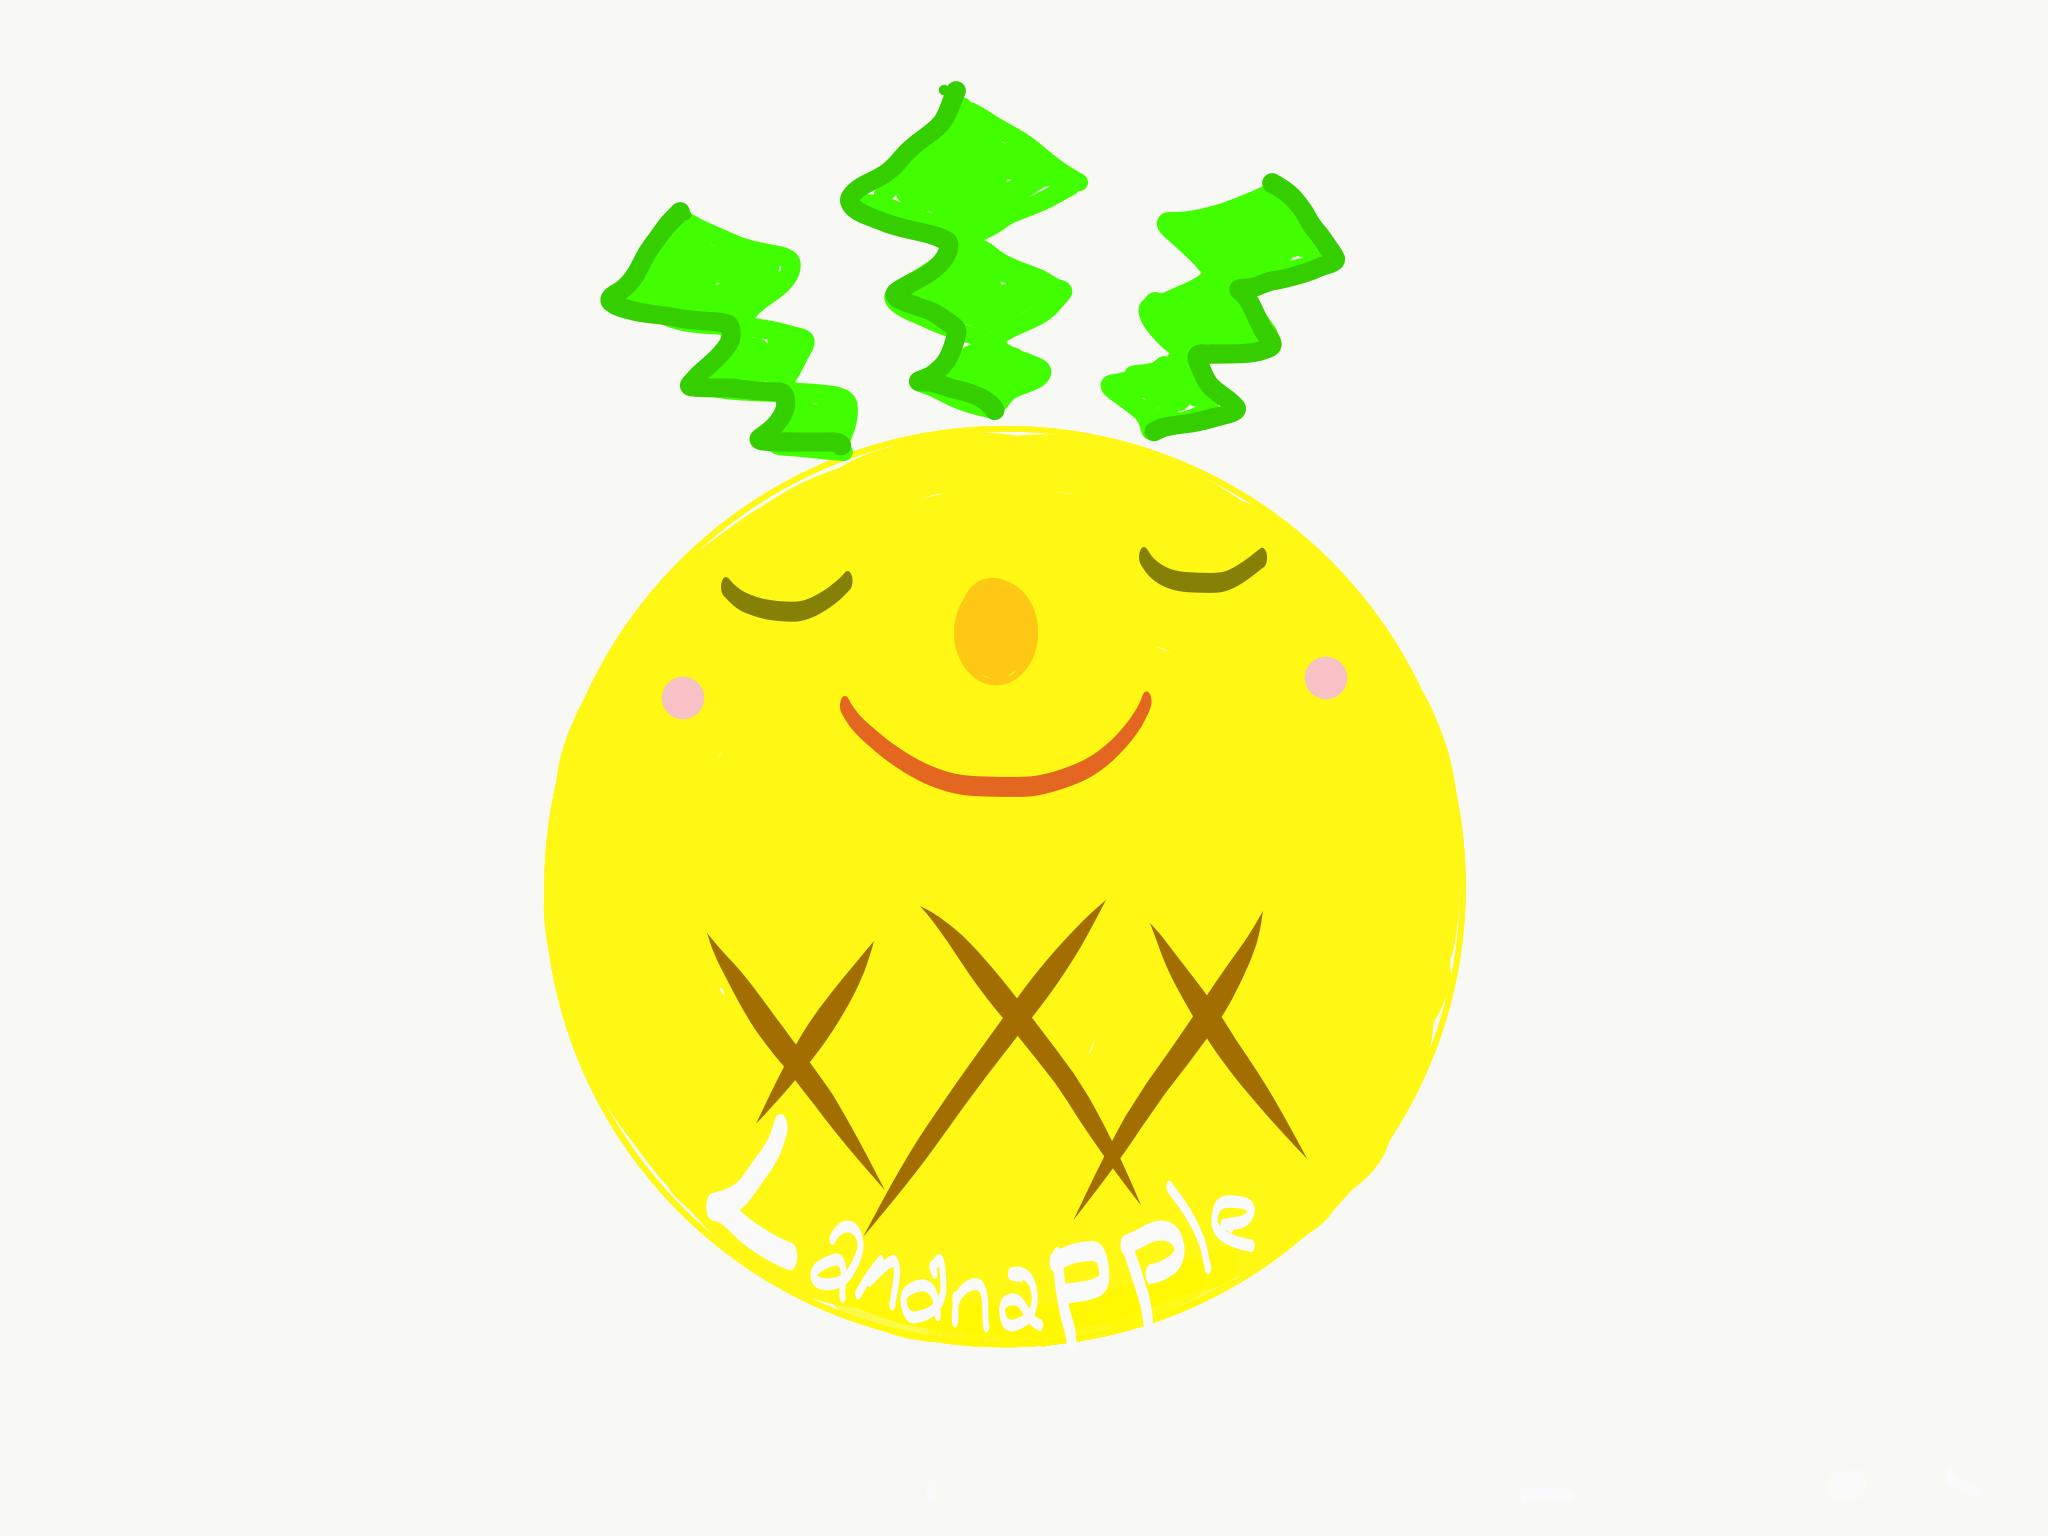 Lananapple